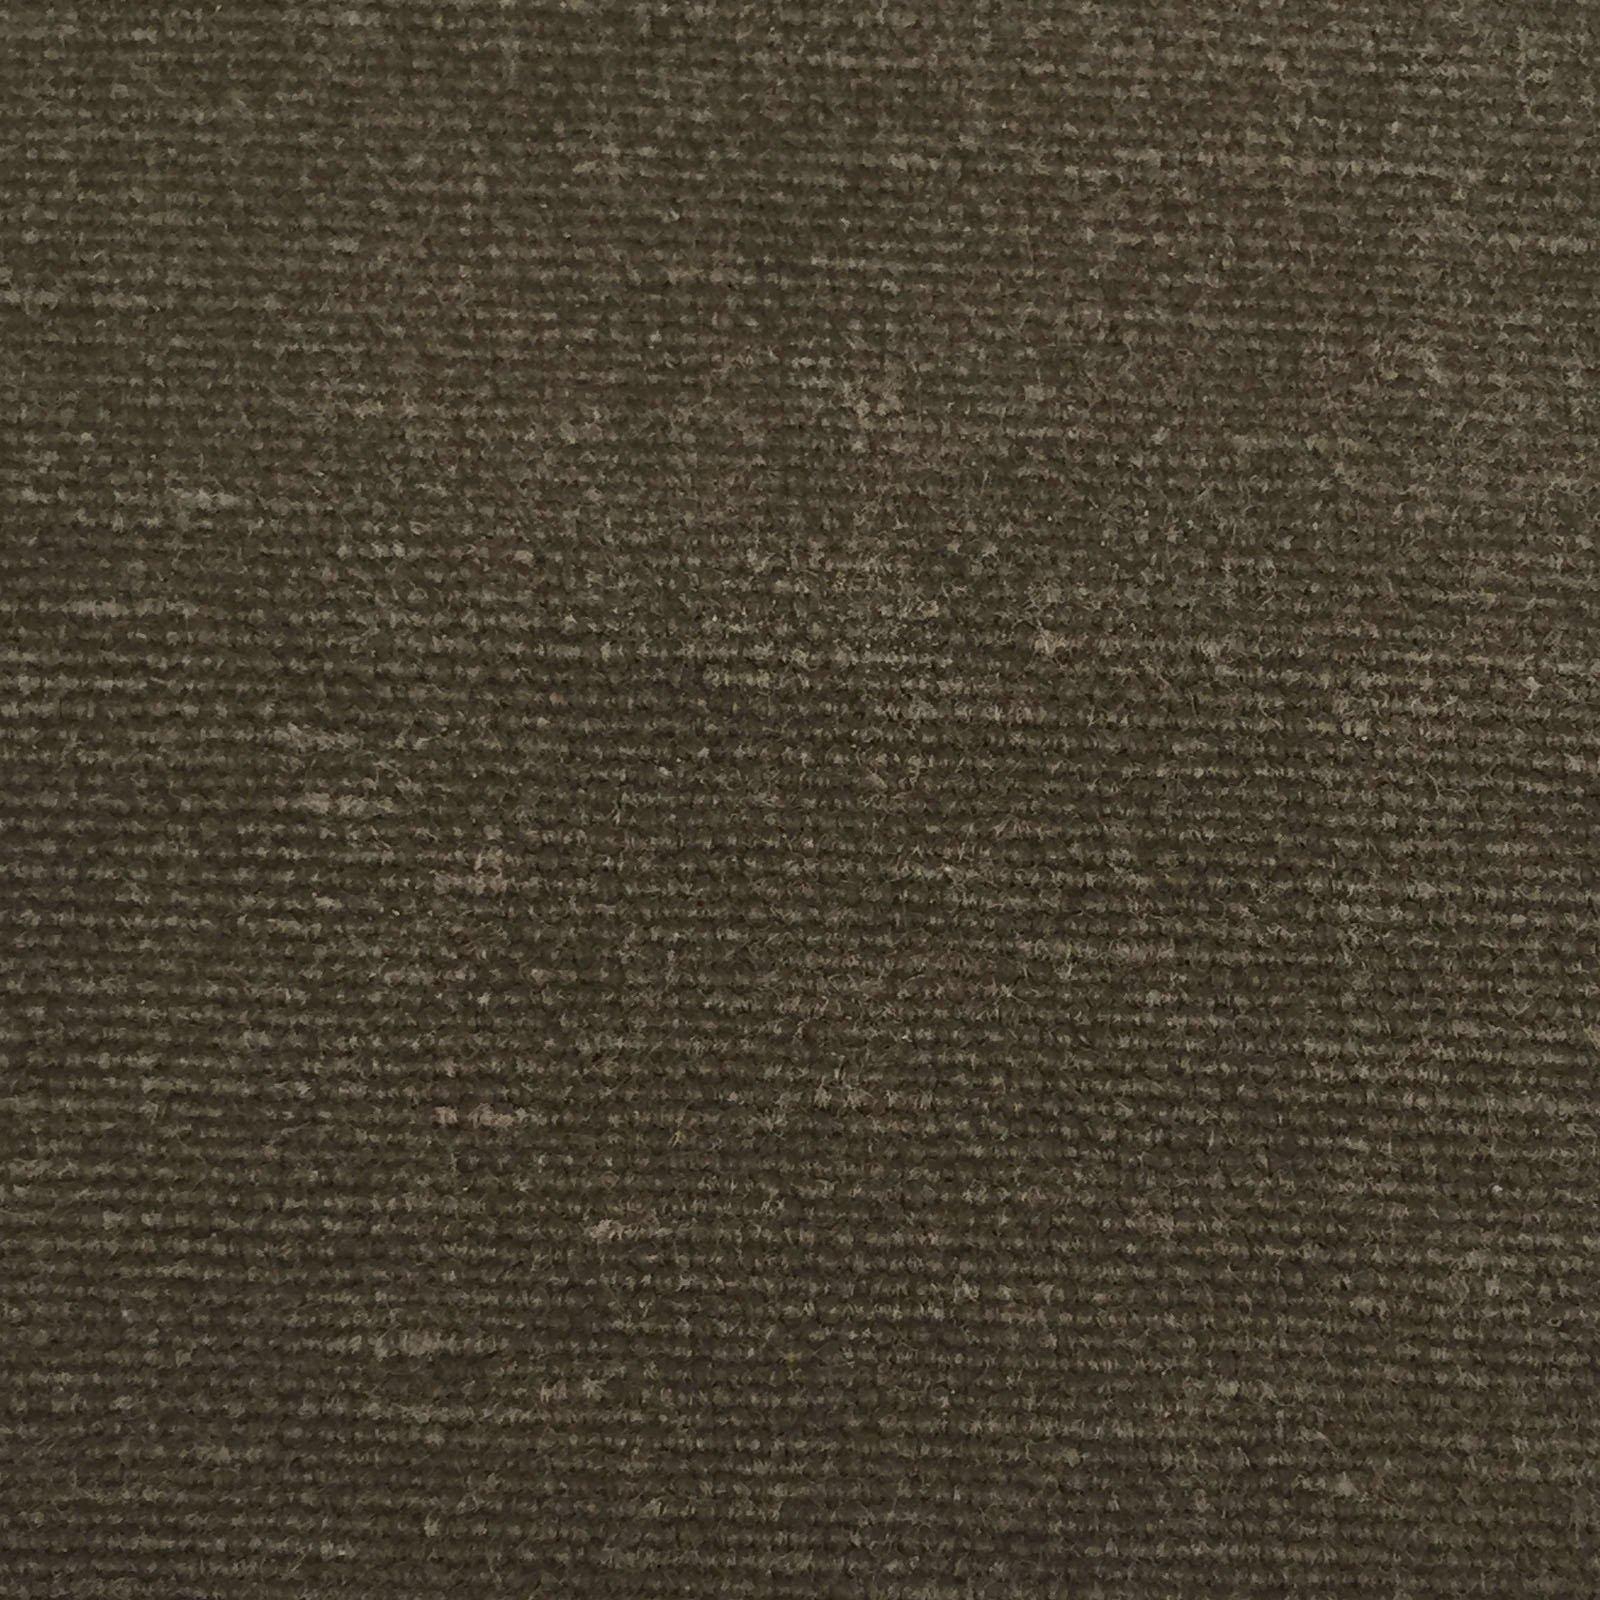 10' x 12' Olive Drab 18 oz Canvas Tarpaulin